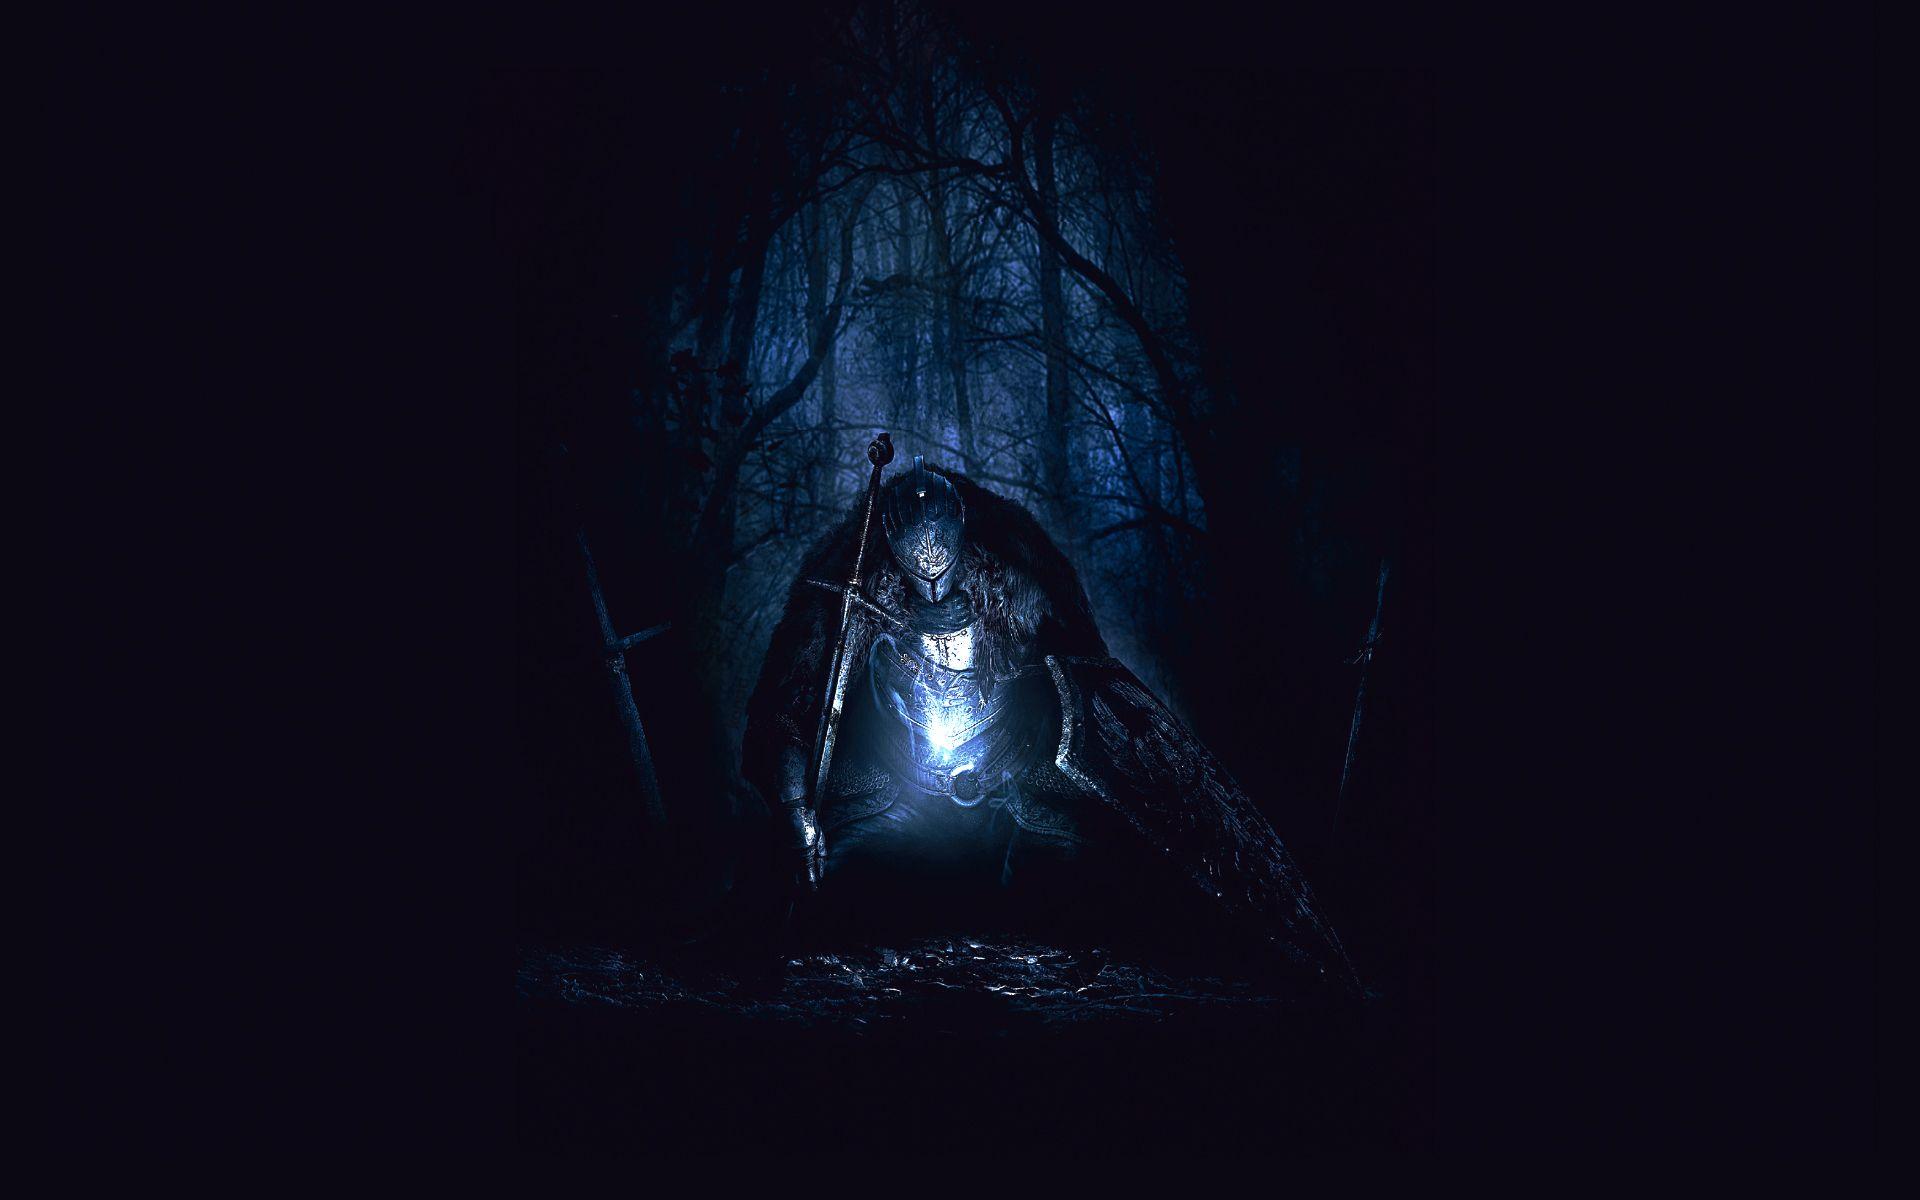 Dark Souls 3 Wallpaper Best Wallpaper Hd Wallpaper